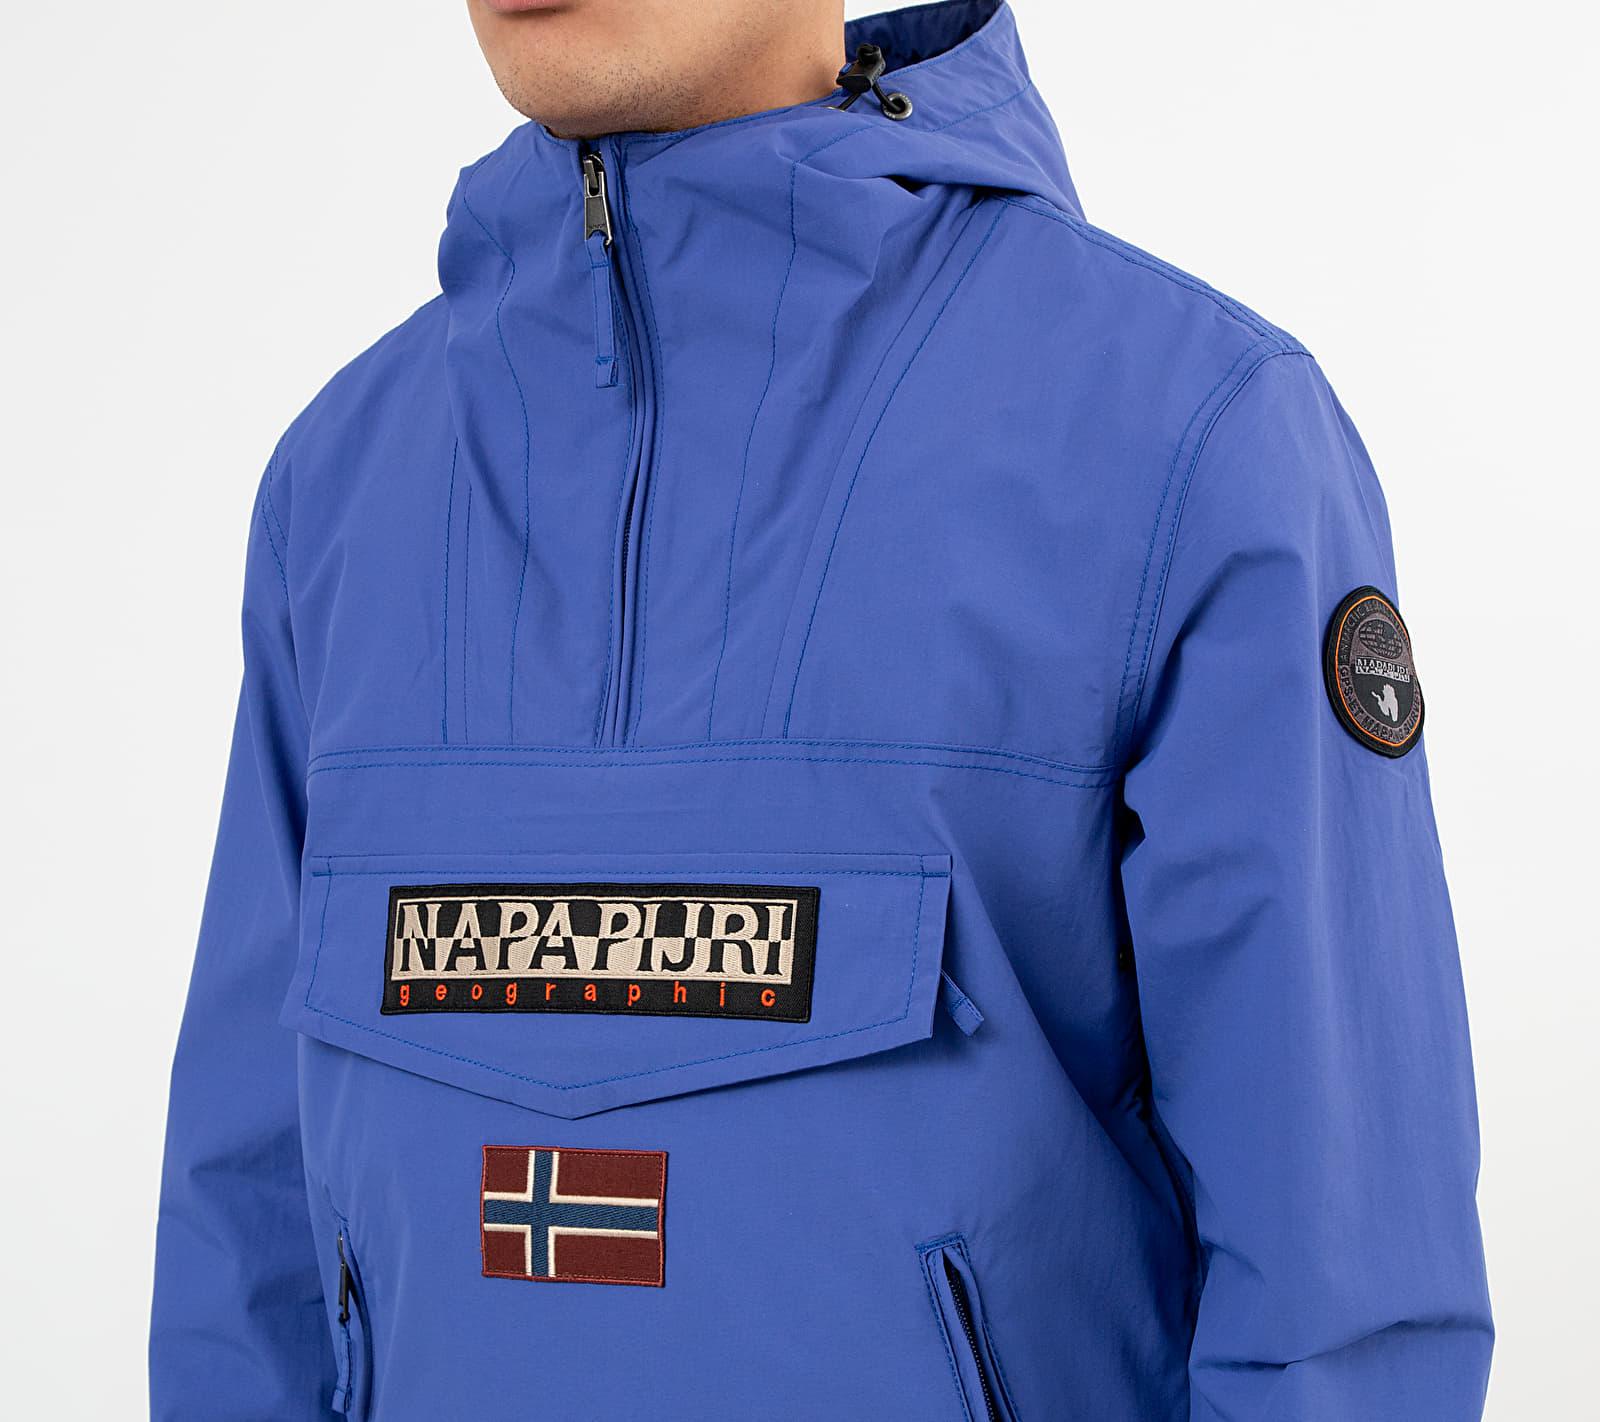 NAPAPIJRI Rainforest Jacket Ultramarine, Blue